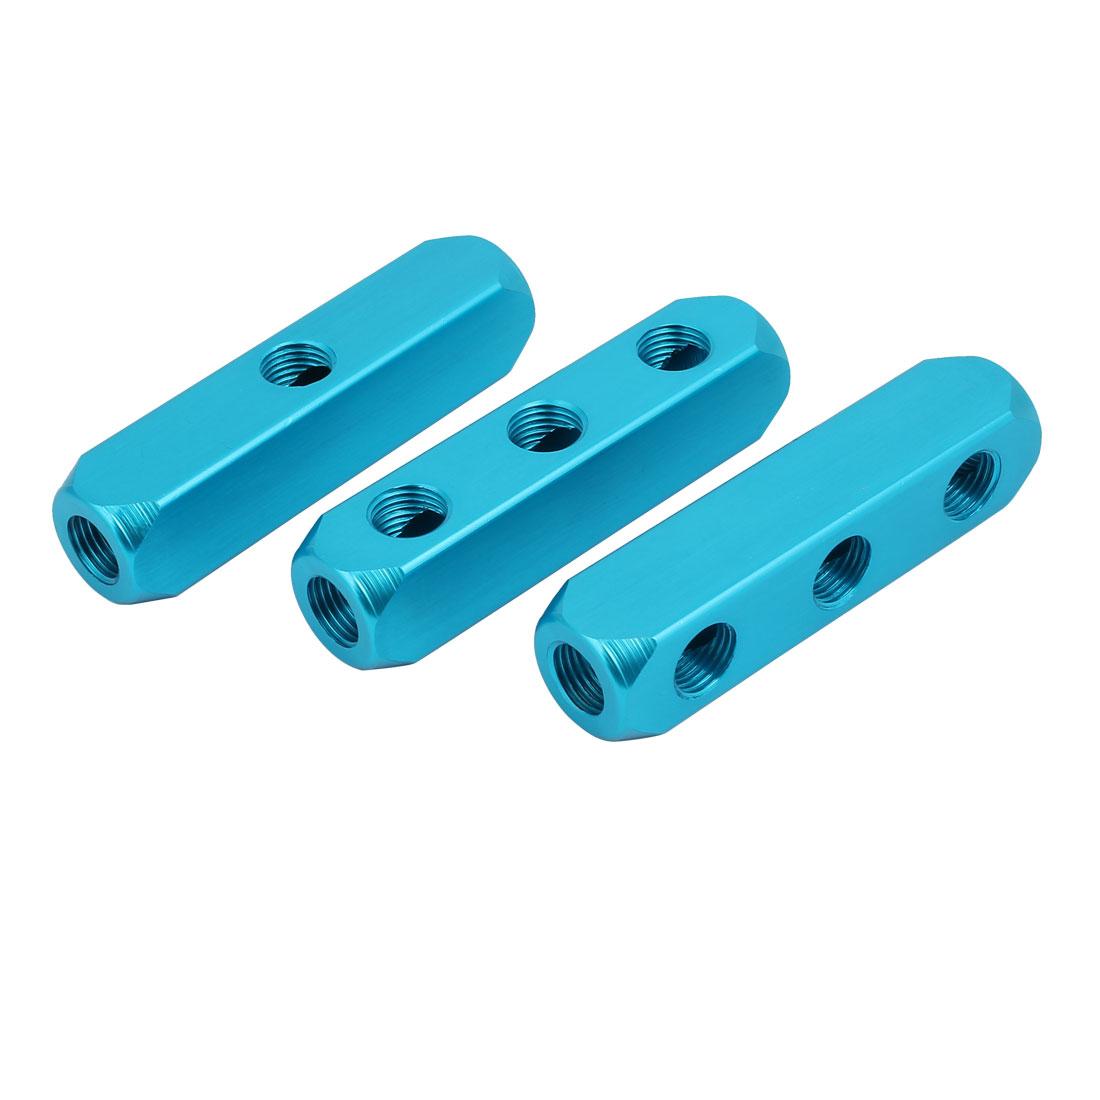 1/4PT Thread 3 Way Quick Connect Air Hose Manifold Block Splitter Blue 3pcs